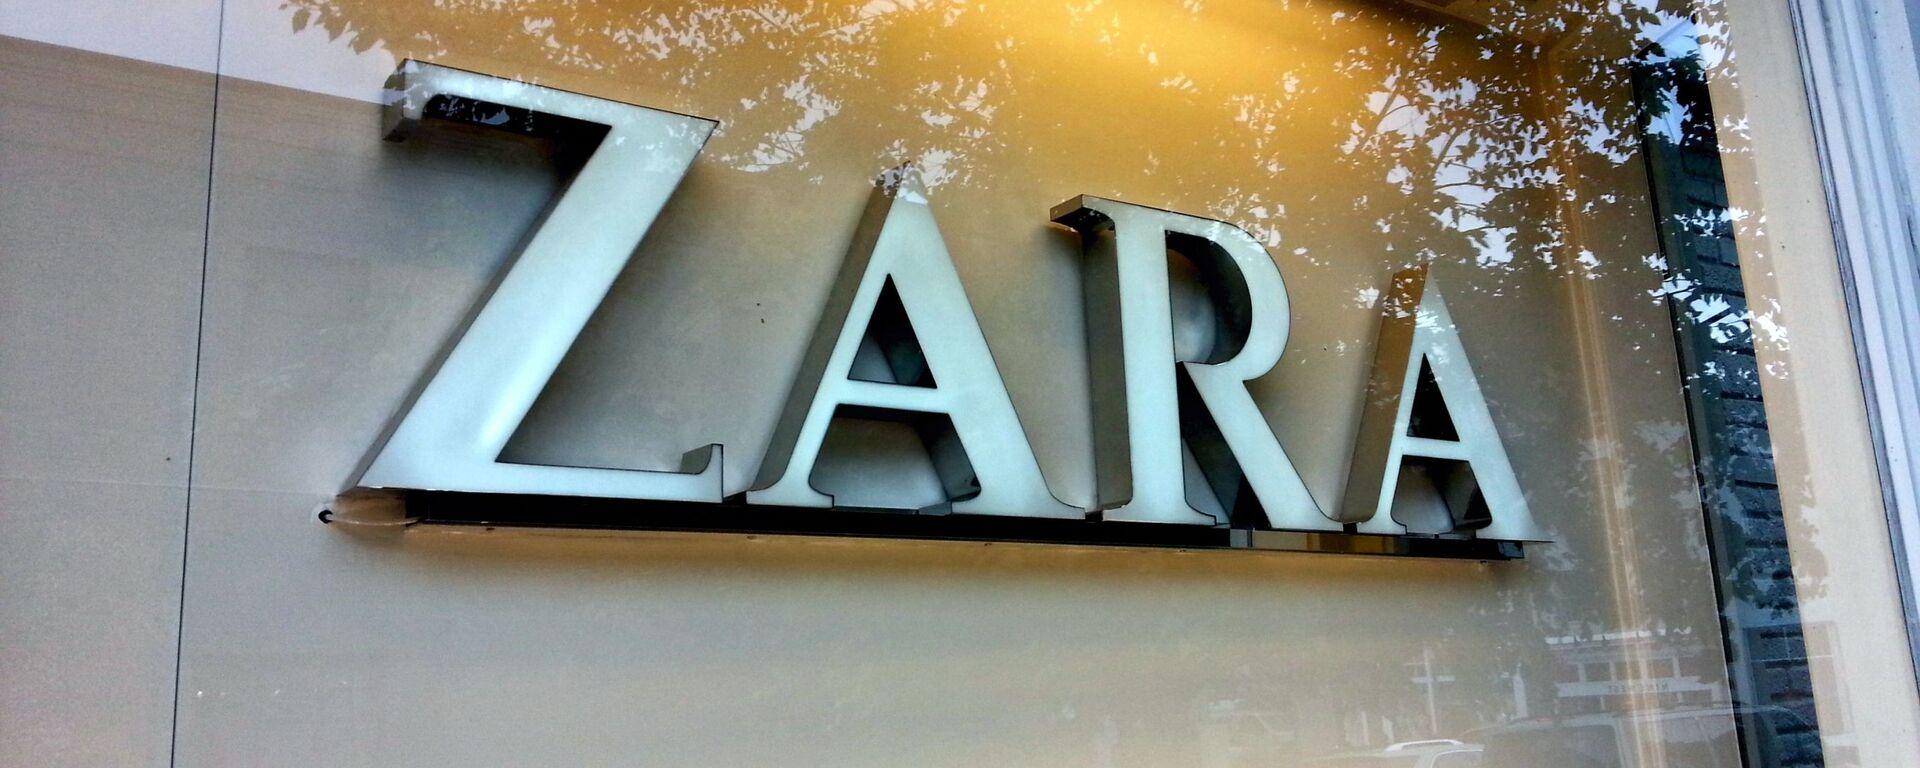 Logo de Zara, marca del grupo español Inditex - Sputnik Mundo, 1920, 29.04.2021